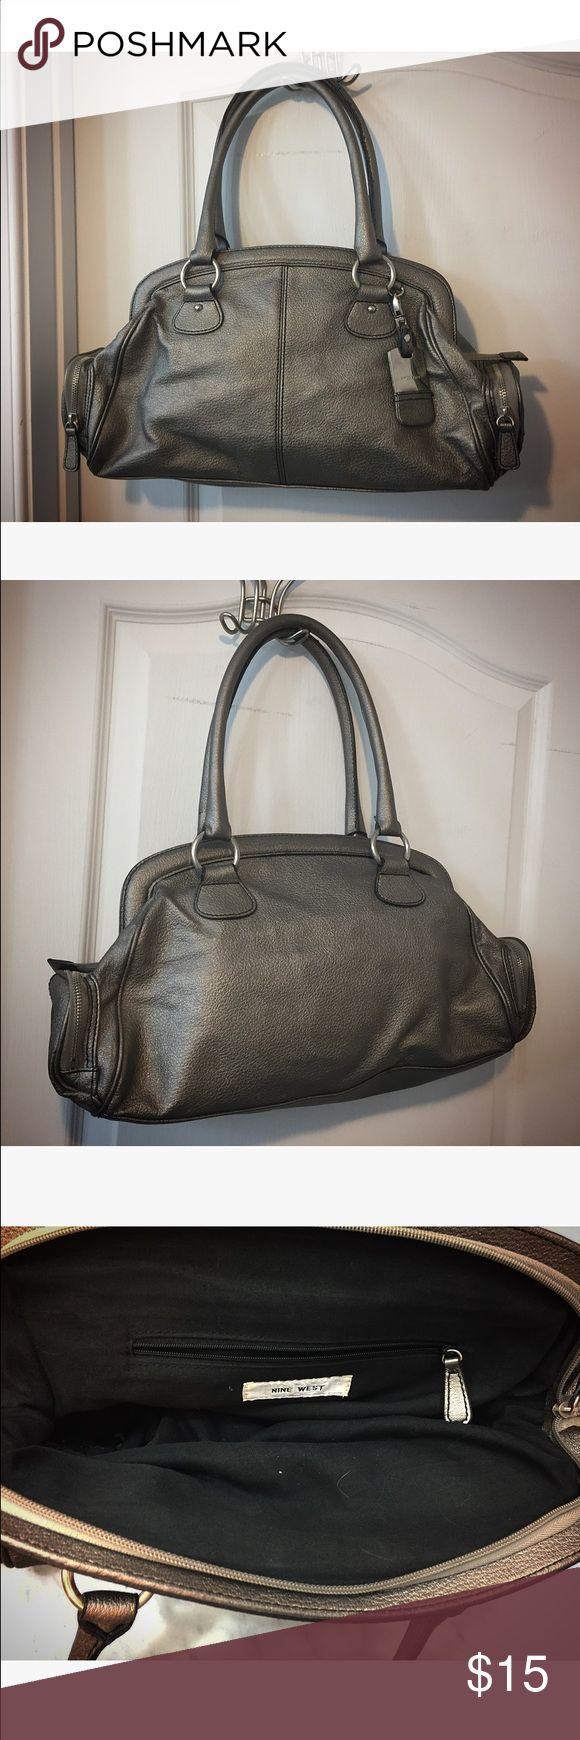 Nine West purse Nine West purse, excellent condition, metallic silver, silver hardware Nine West Bags Shoulder Bags